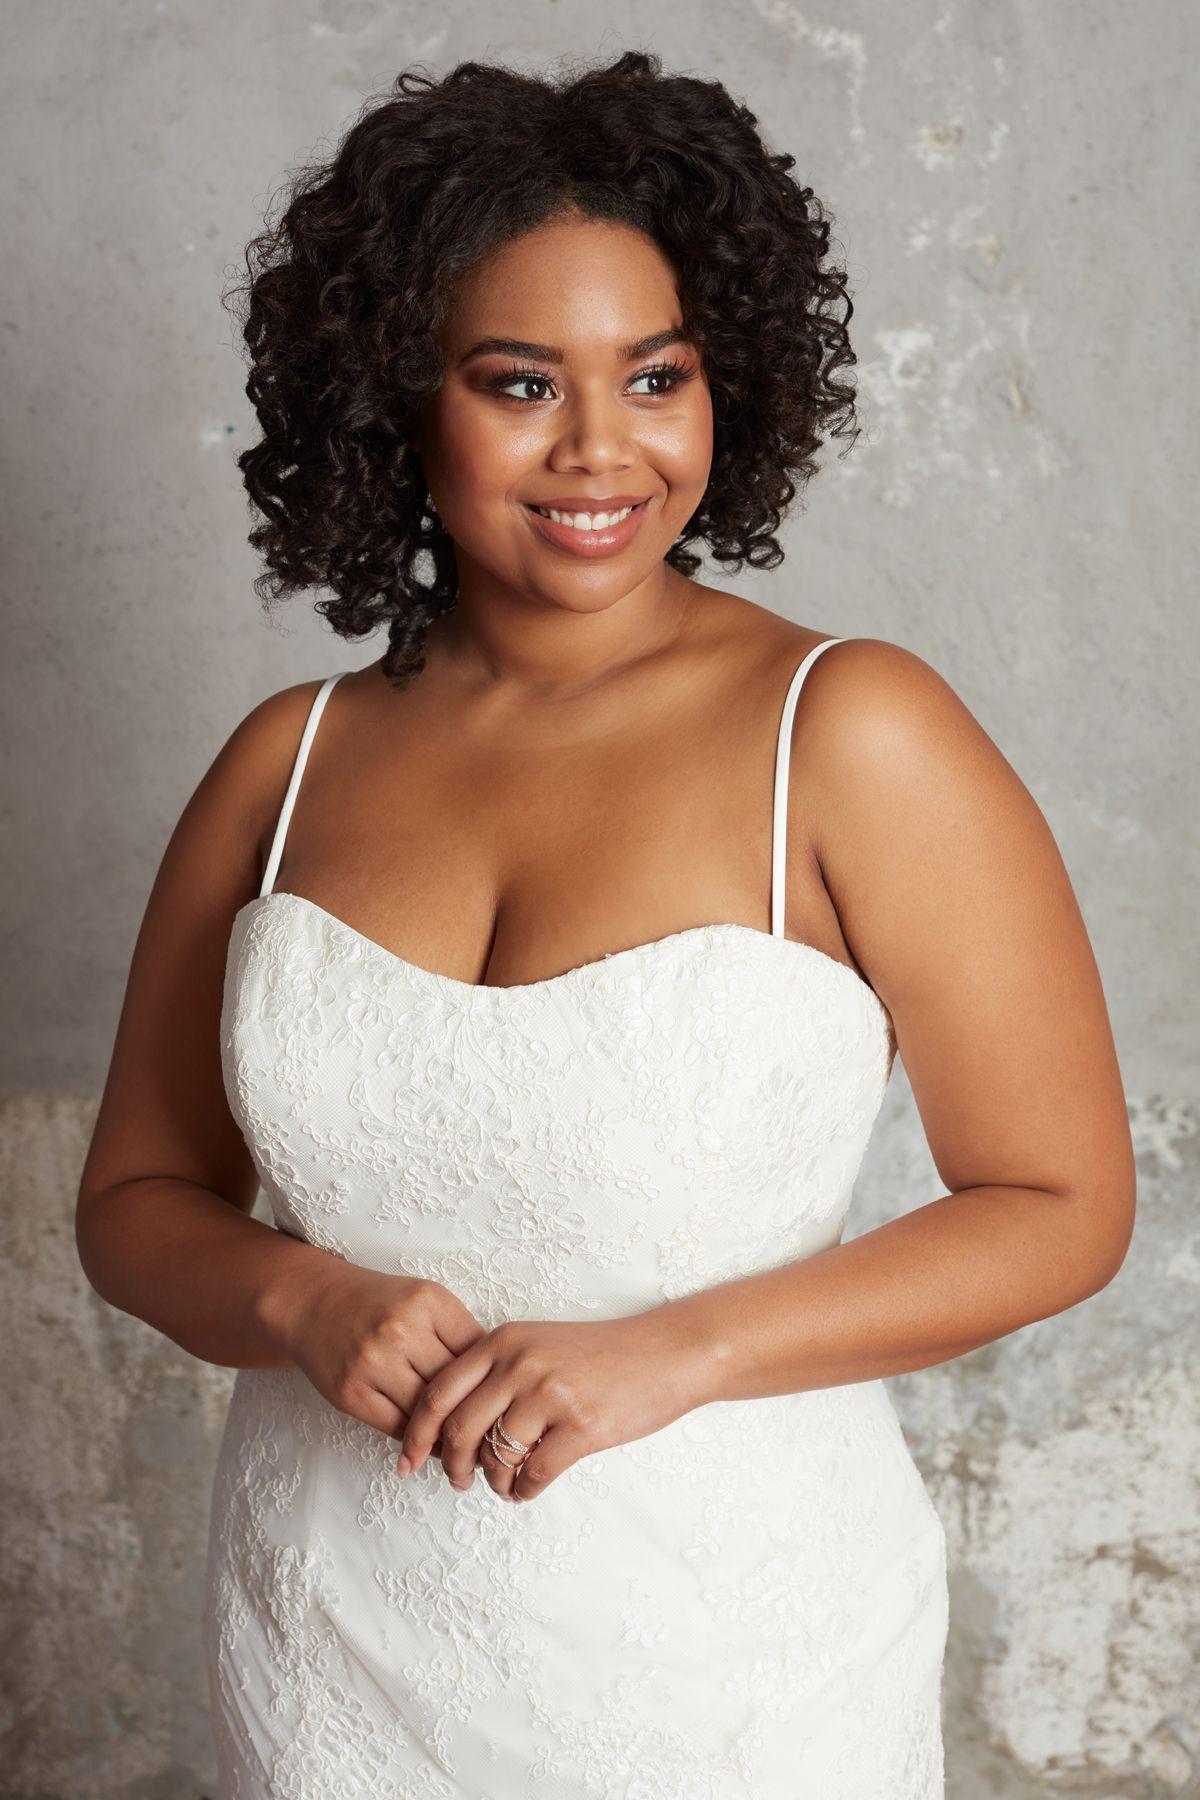 37+ Strapless bra for wedding dress plus size ideas in 2021